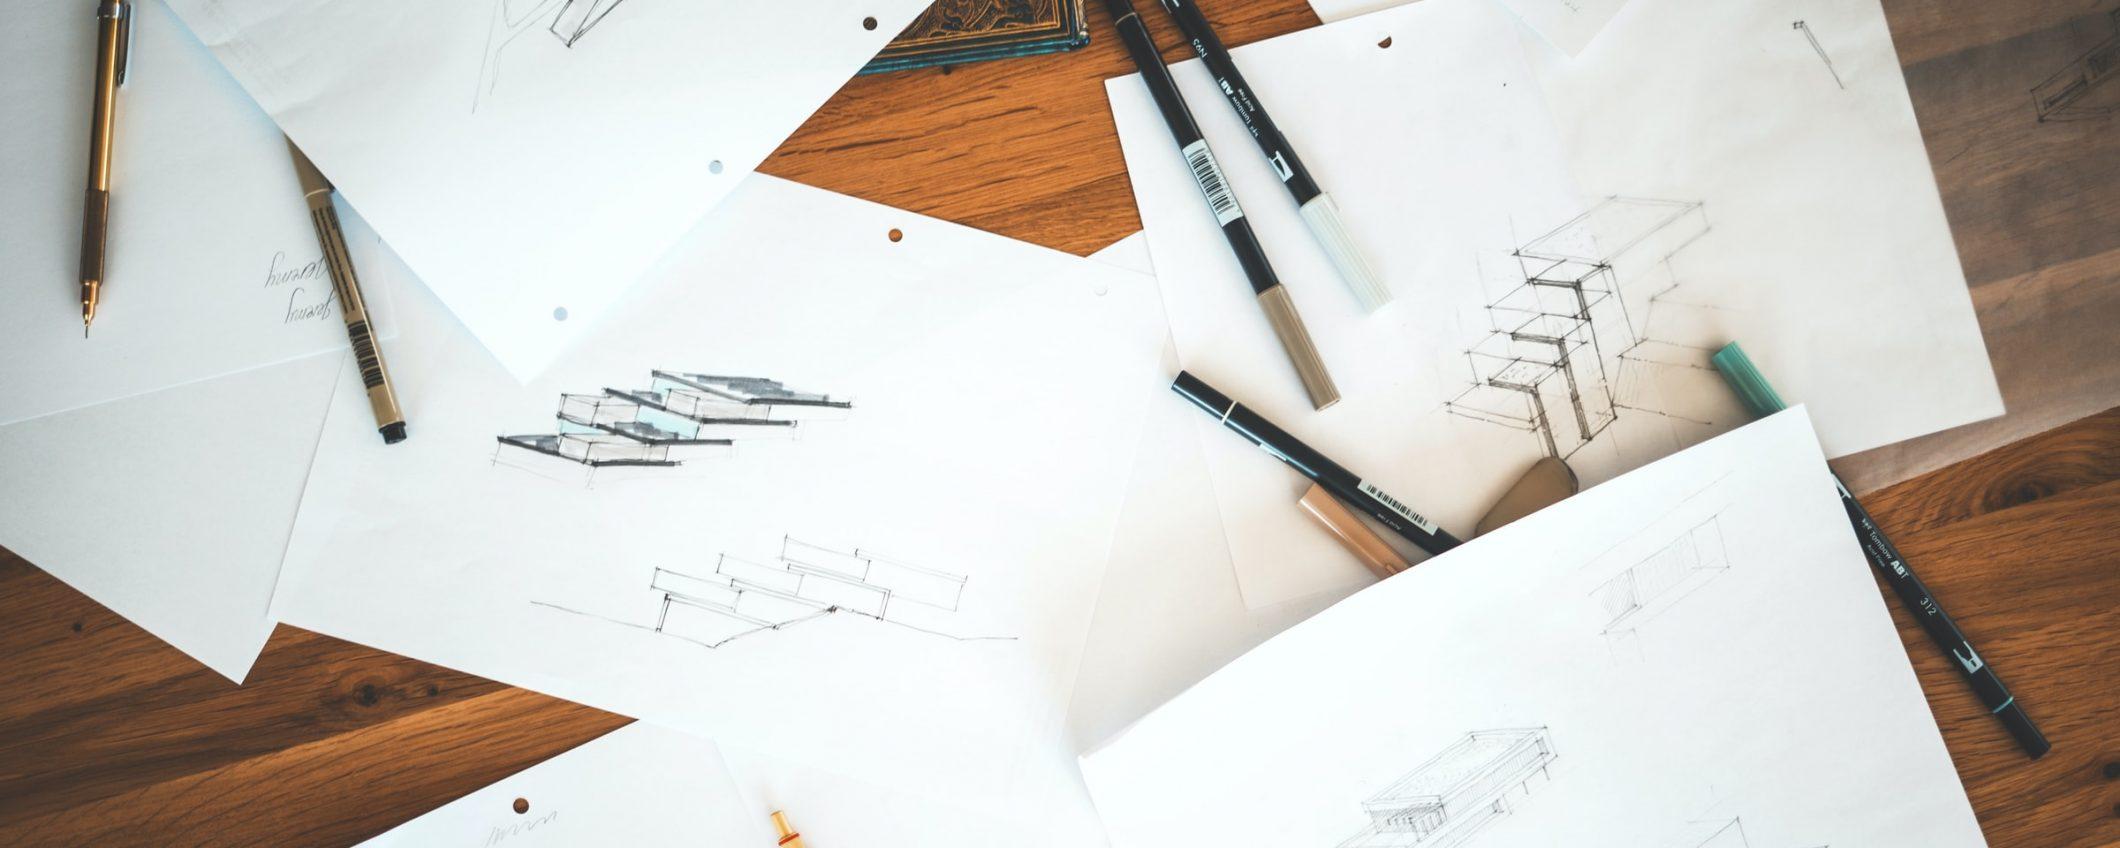 Laurea online architettura moda design